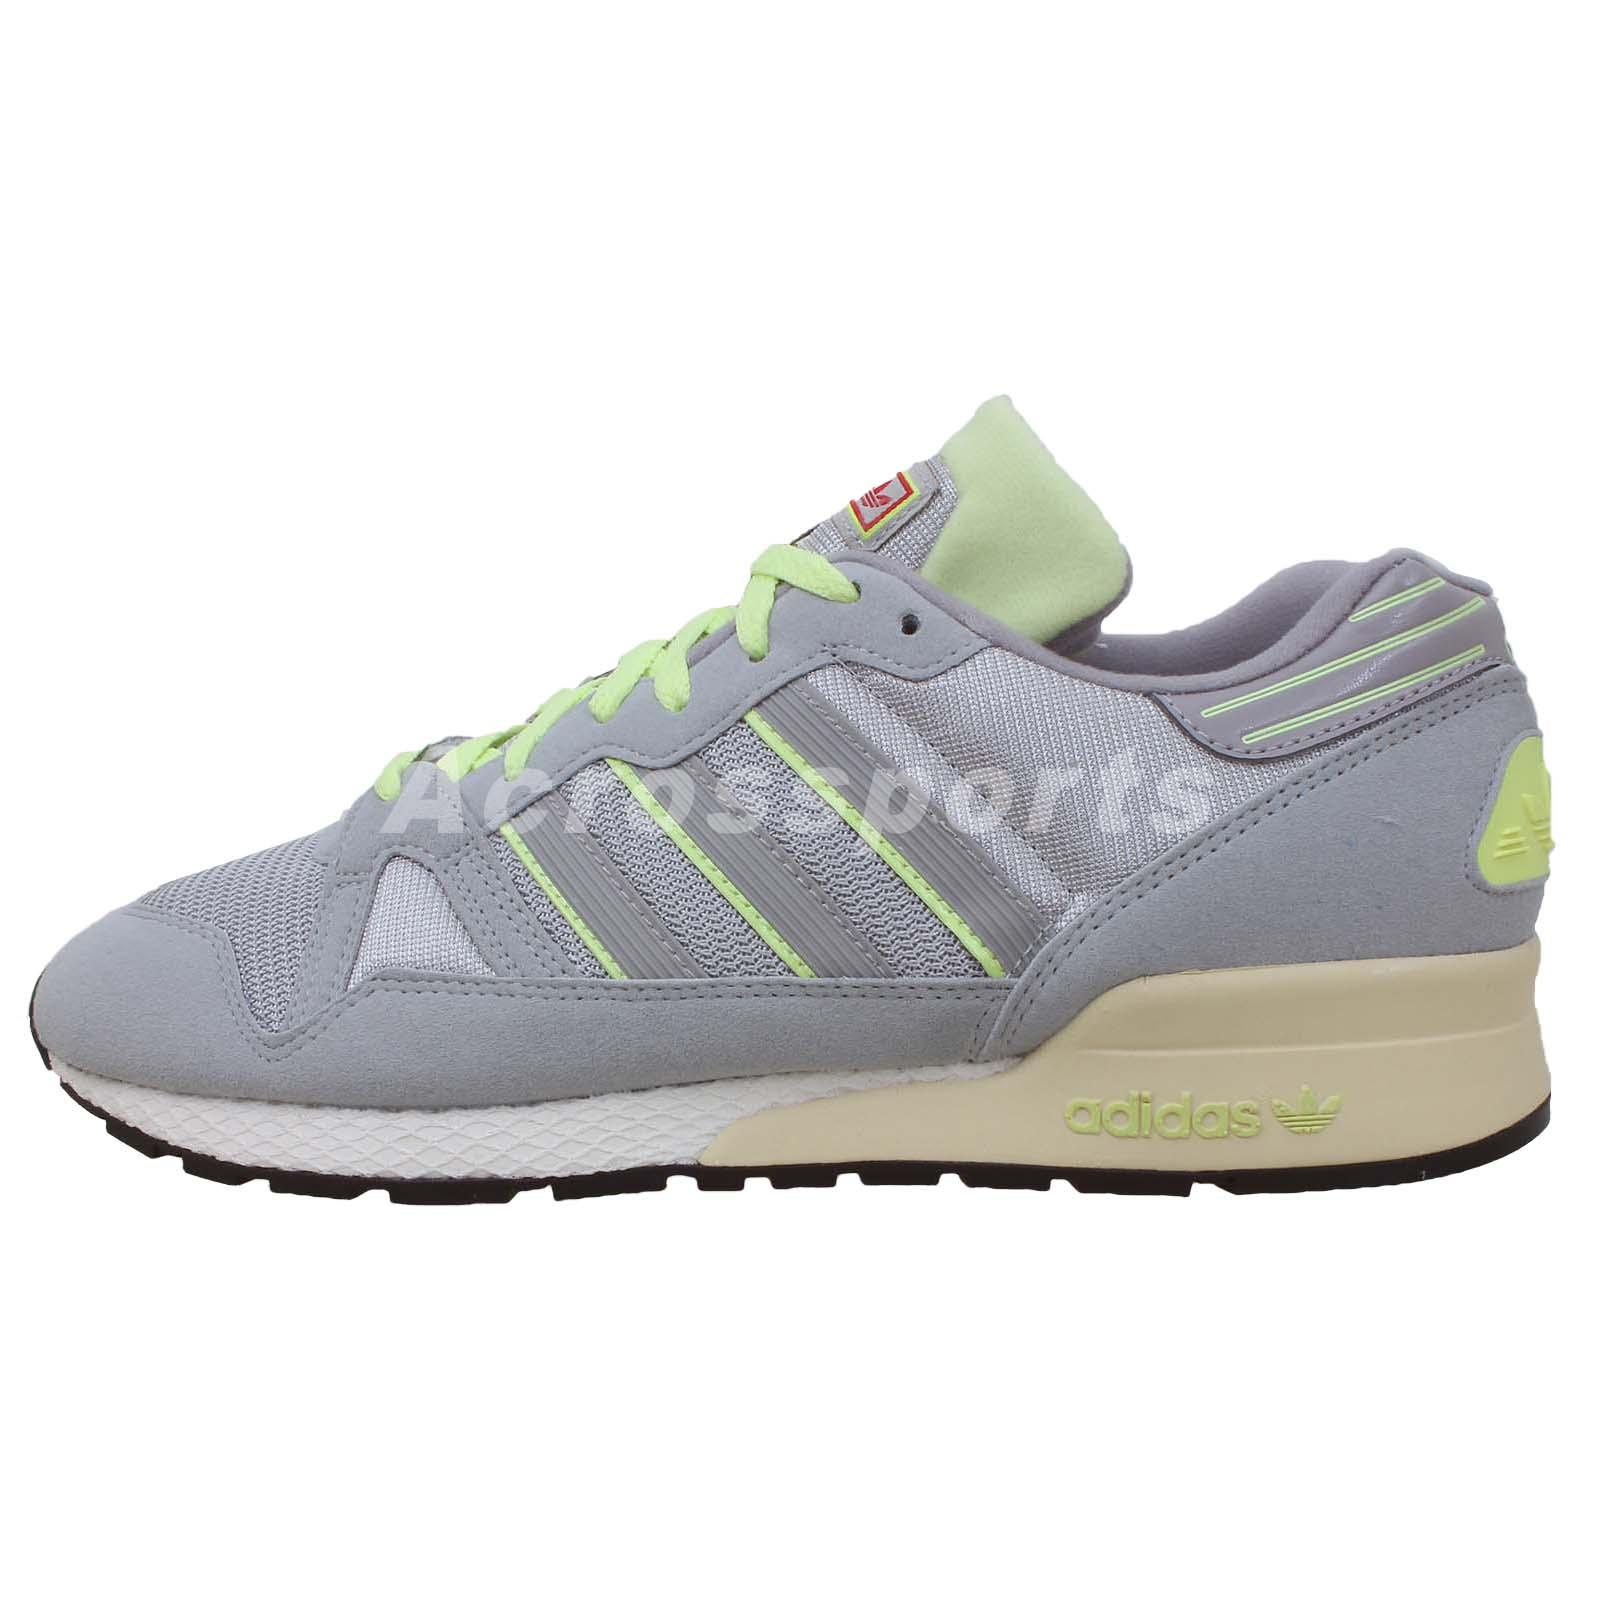 adidas originals zx 710 mens retro running shoes fashion